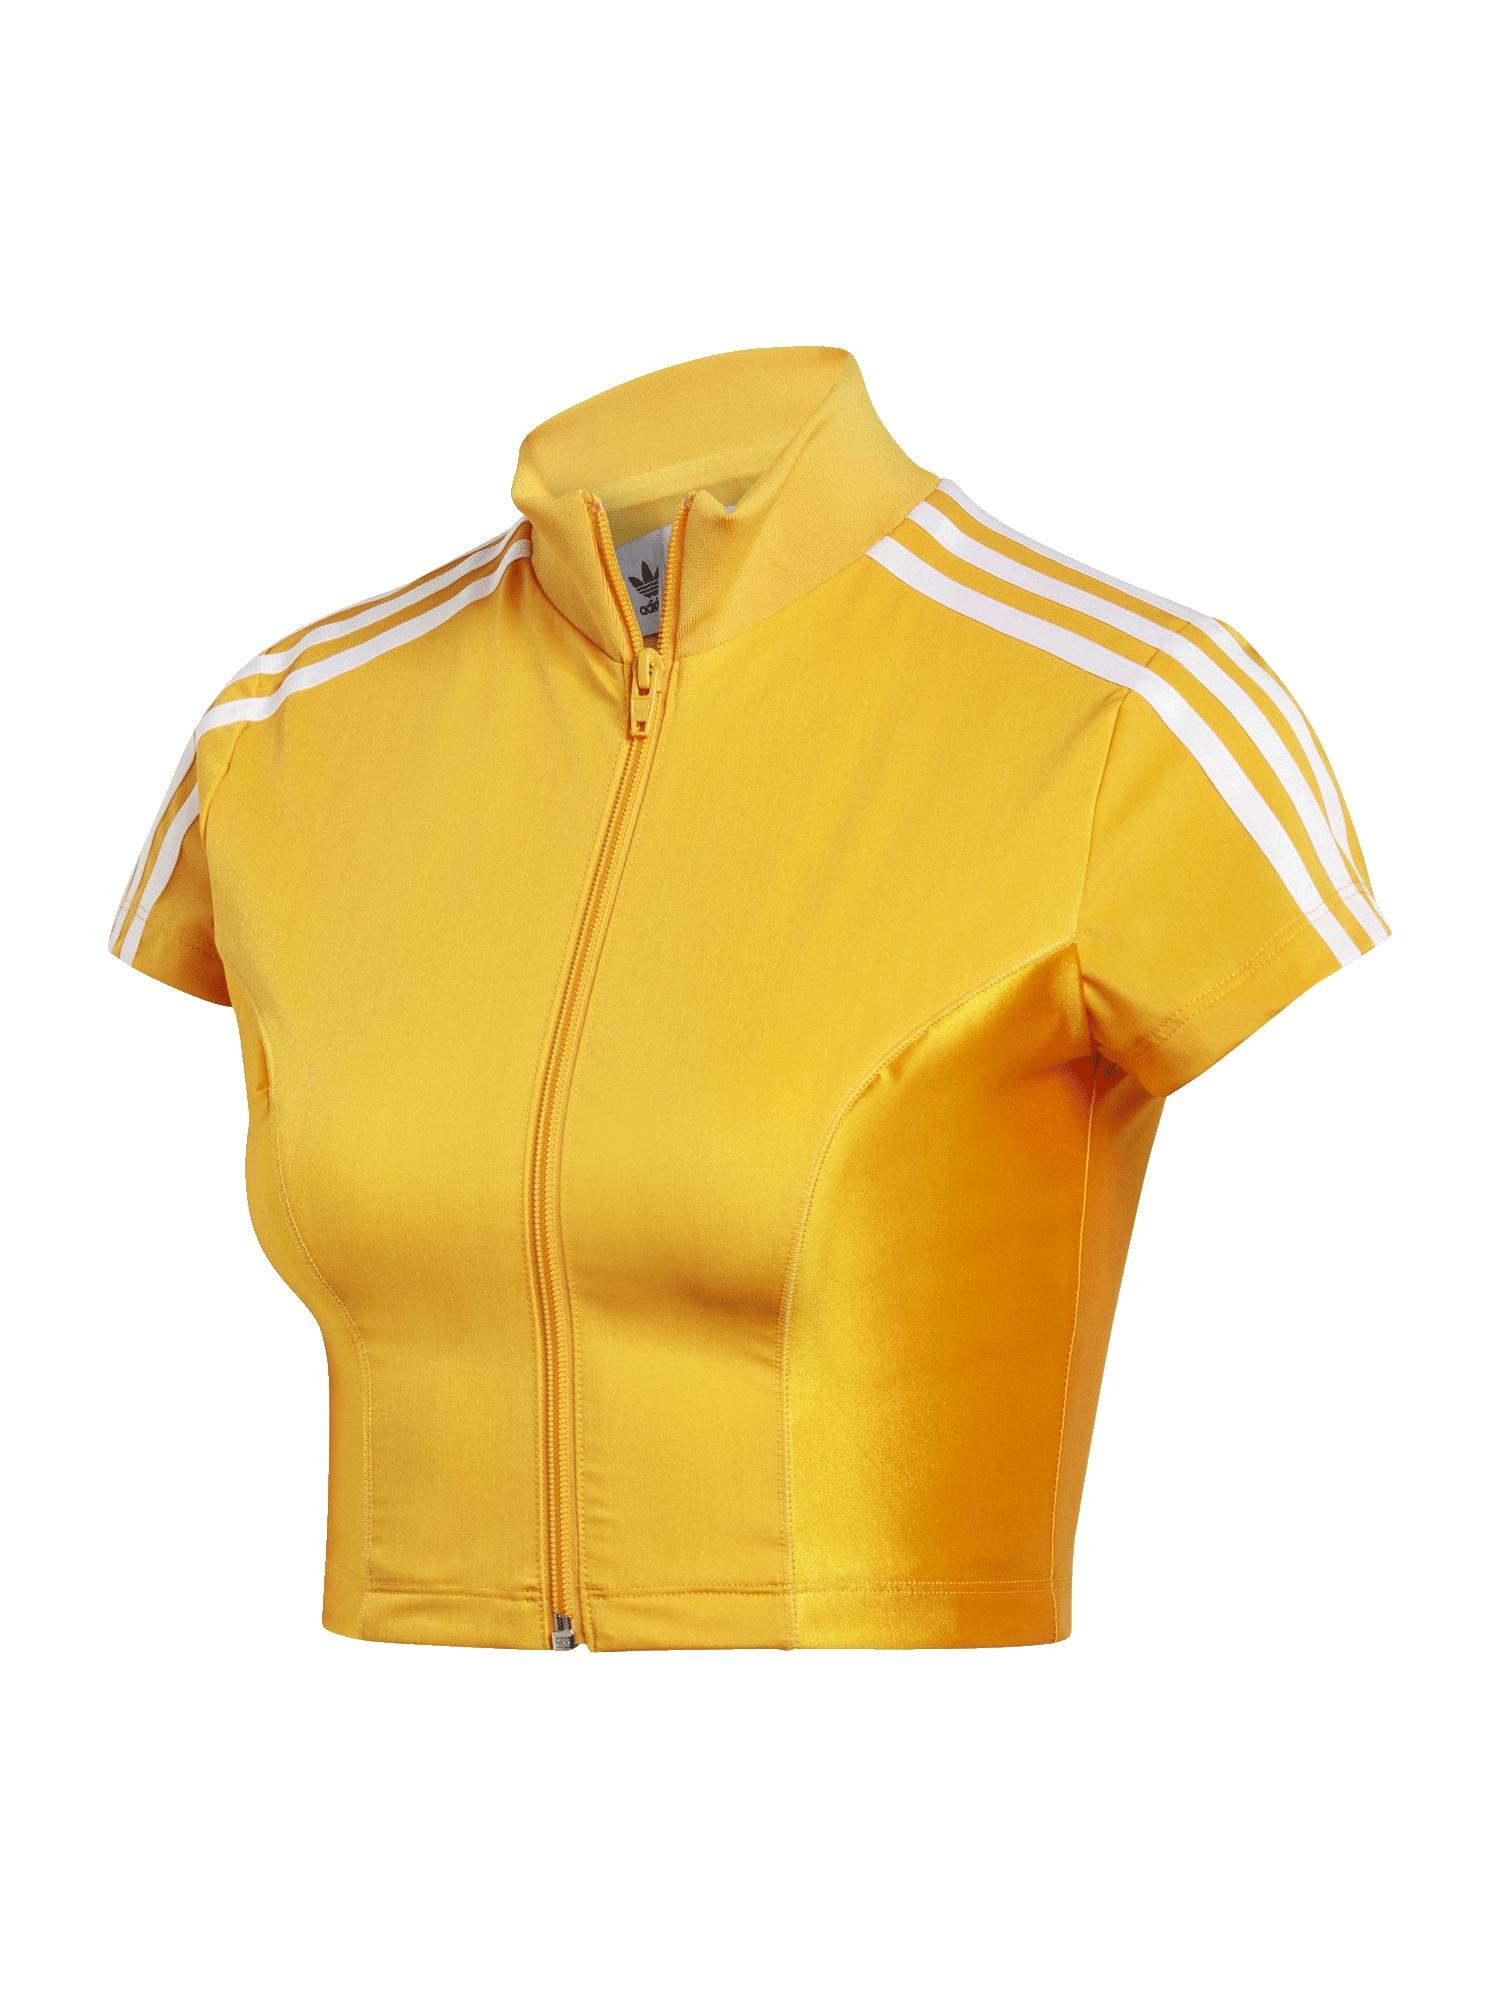 ADIDAS ORIGINALS Top  žlutá